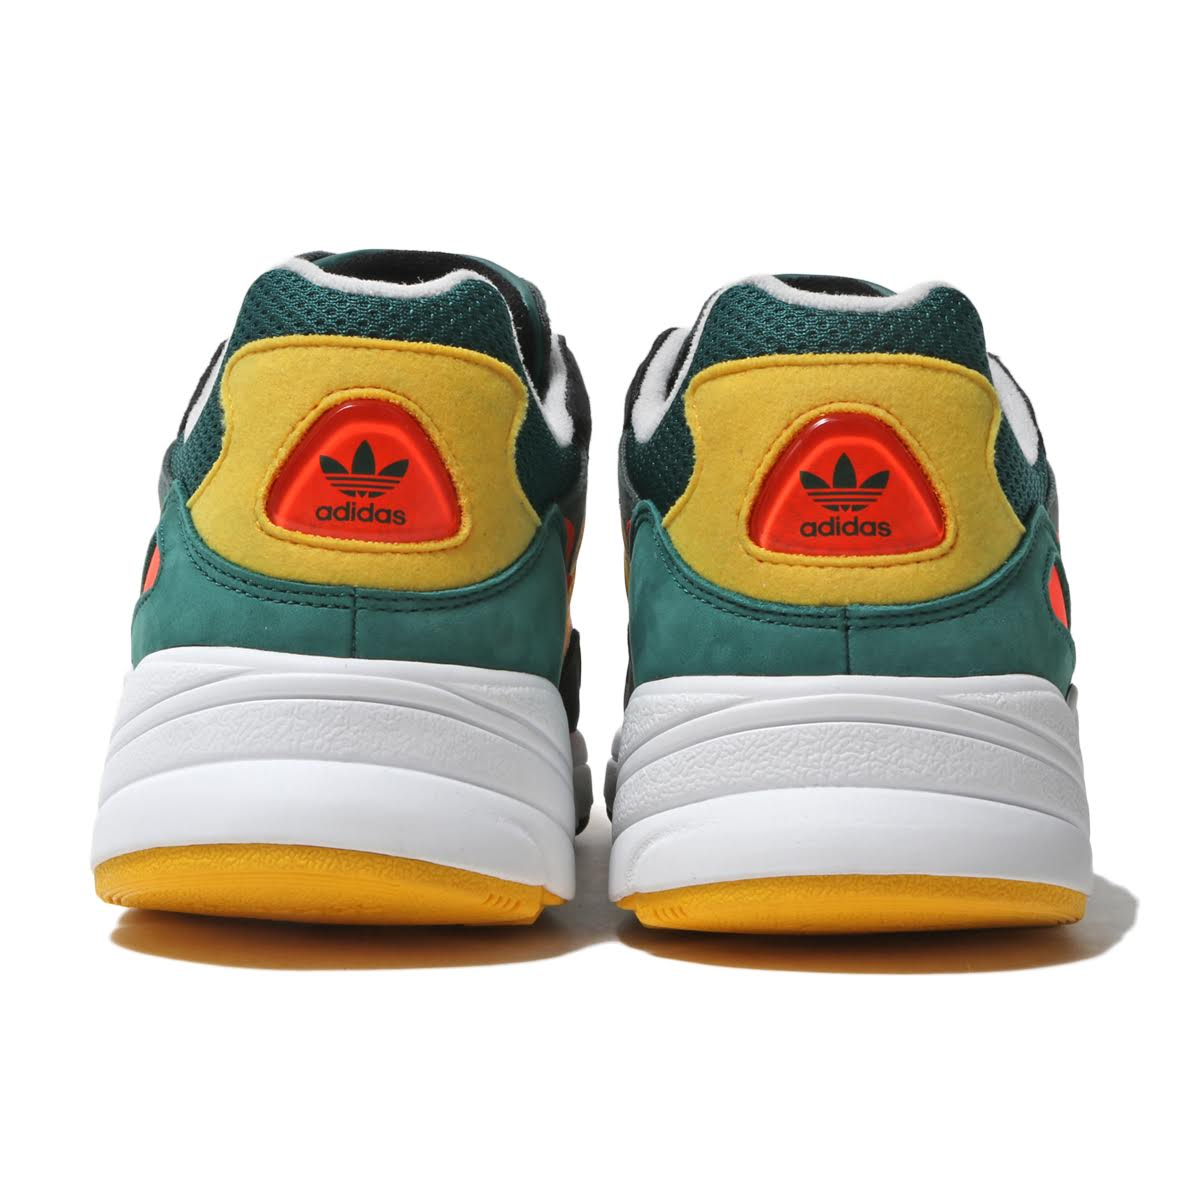 adidas Originals YUNG 96(GREY ONEBOLD GOLDSOLAR RED)(アディダスオリジナルス ヤング 96)【メンズ】【スニーカー】【19SS I】 Kinetics